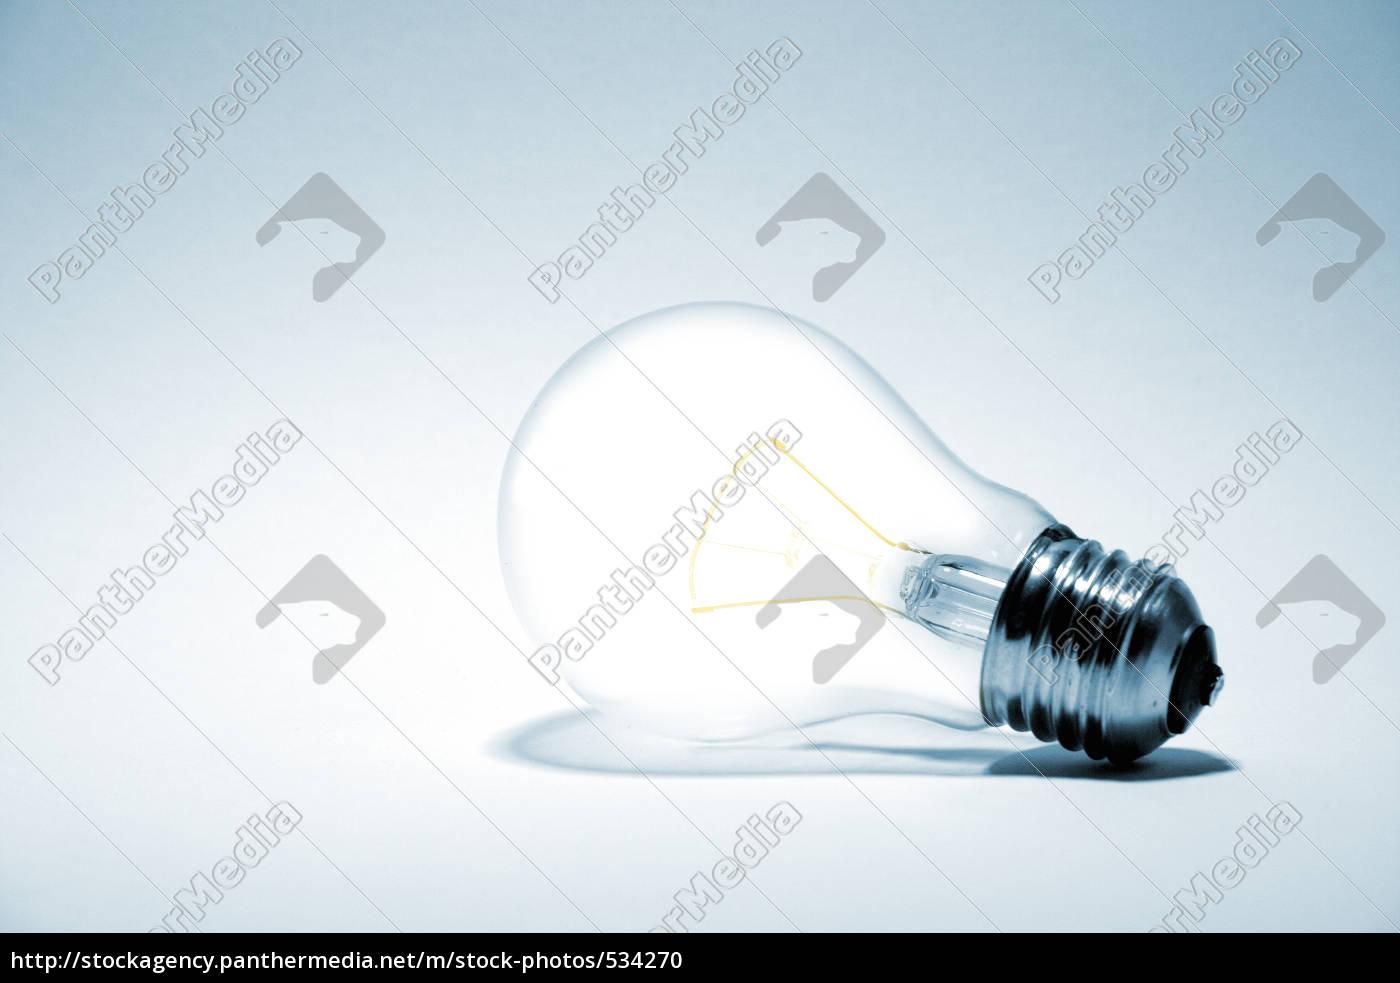 glowing, lightbulb - 534270